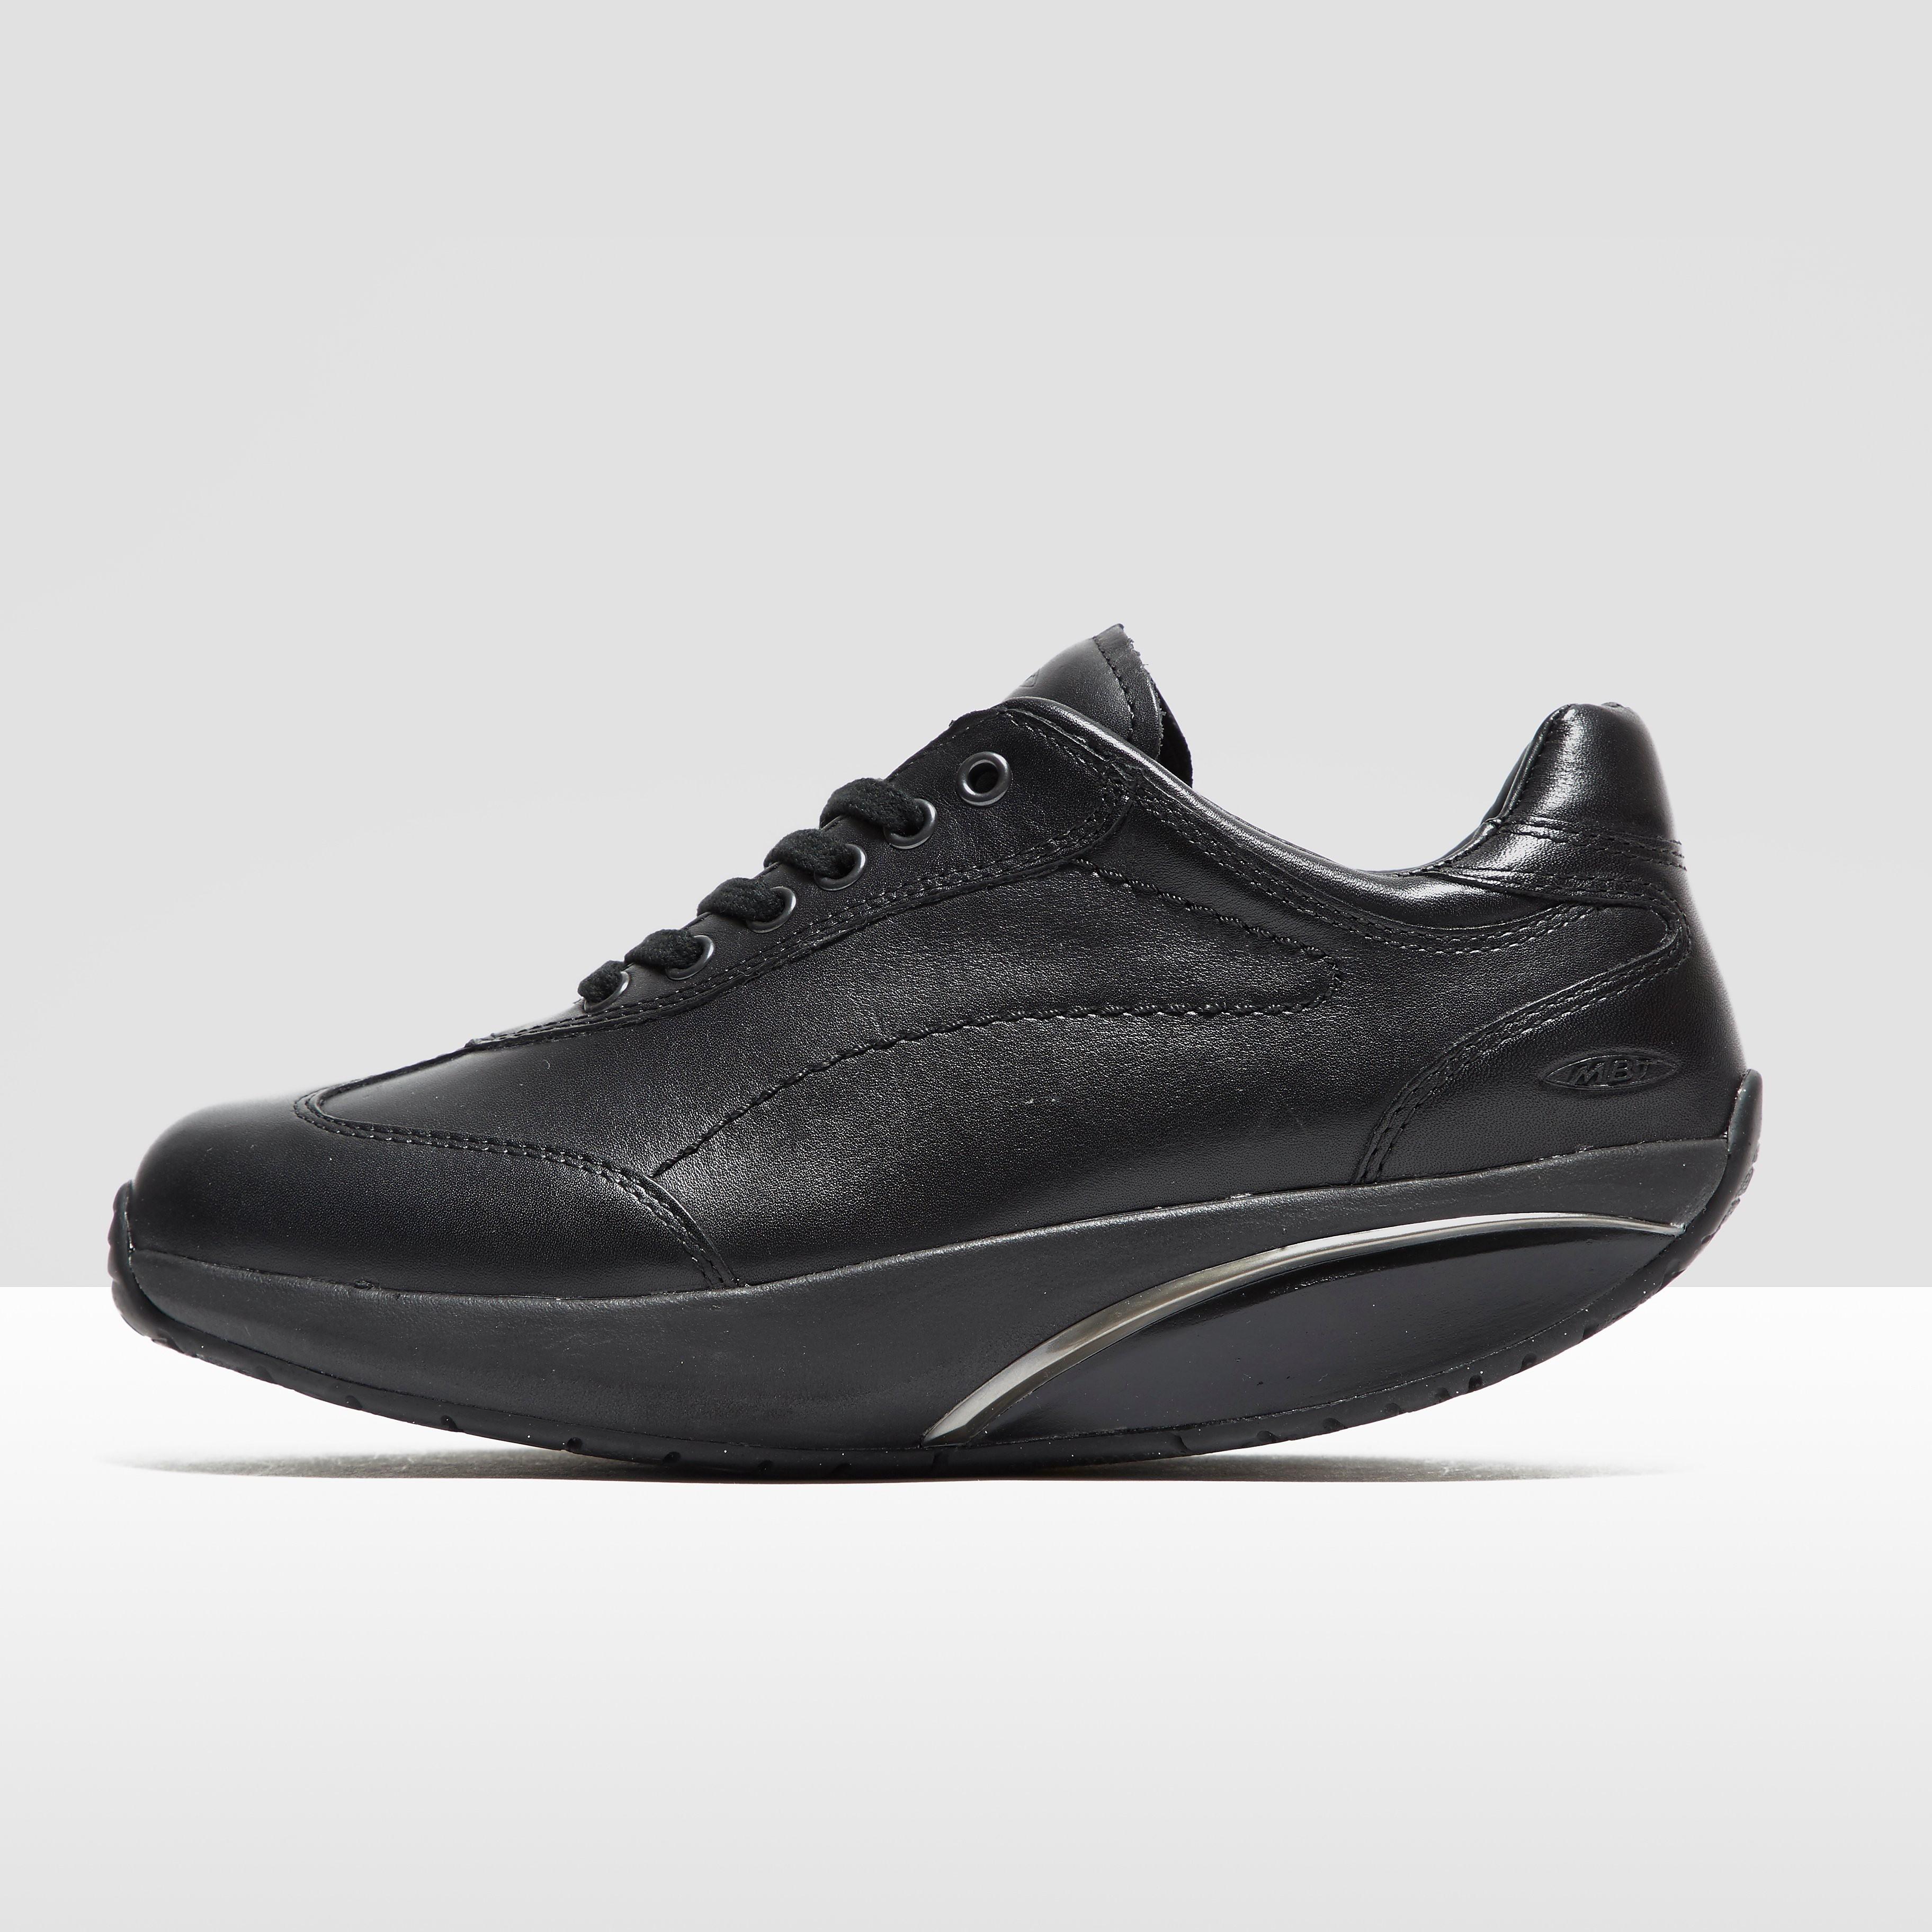 MBT Pata 65 Women's Walking Shoes